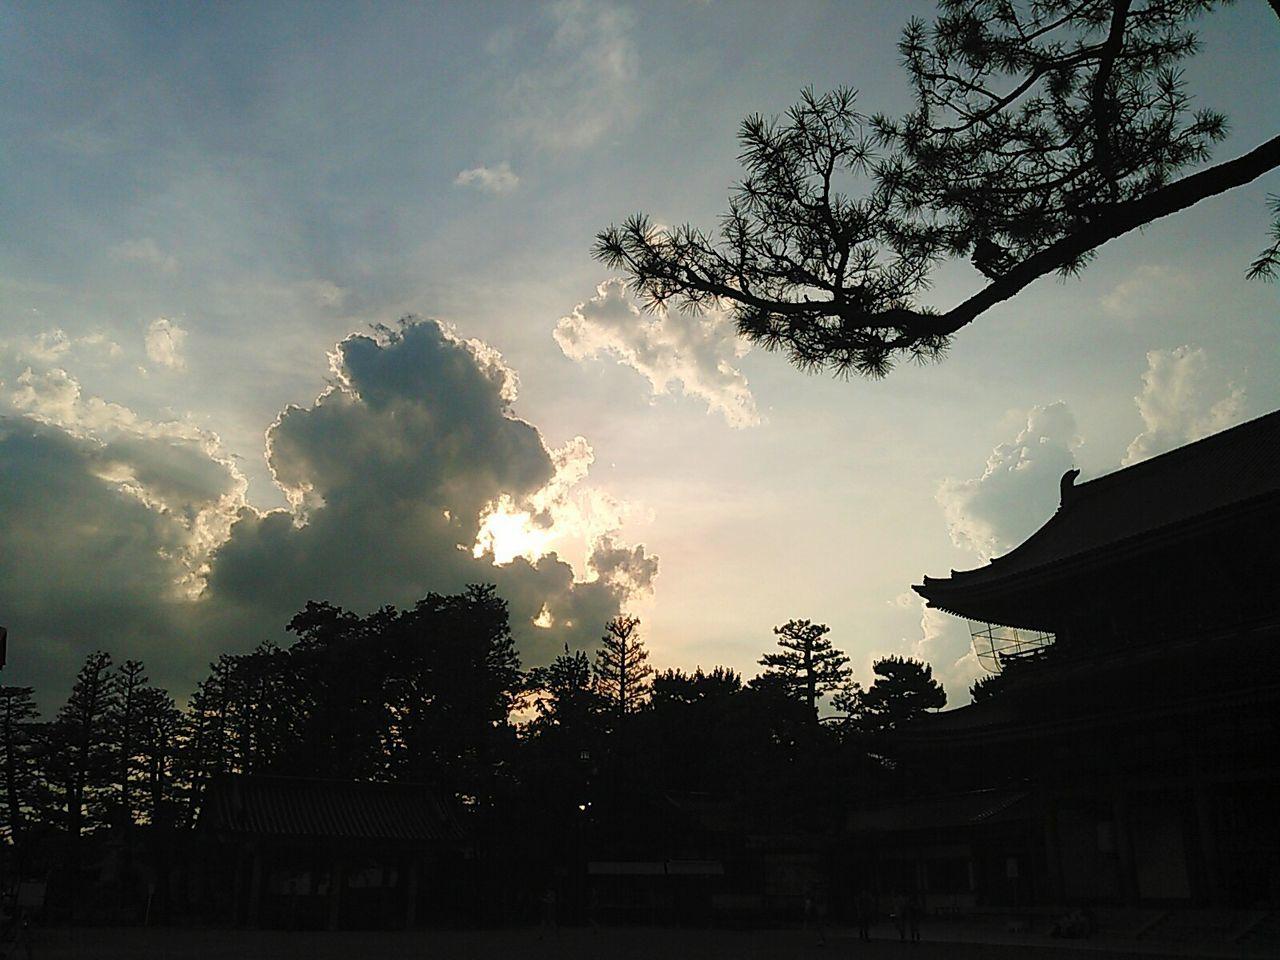 平安神宮の黄昏。 京都 Kyoto 平安神宮 Heian Jingu Heian Shrine 神社 Shrine 夕方 夕暮れ 空 黄昏 Evening Evening Sky Twilight Twilight Sky